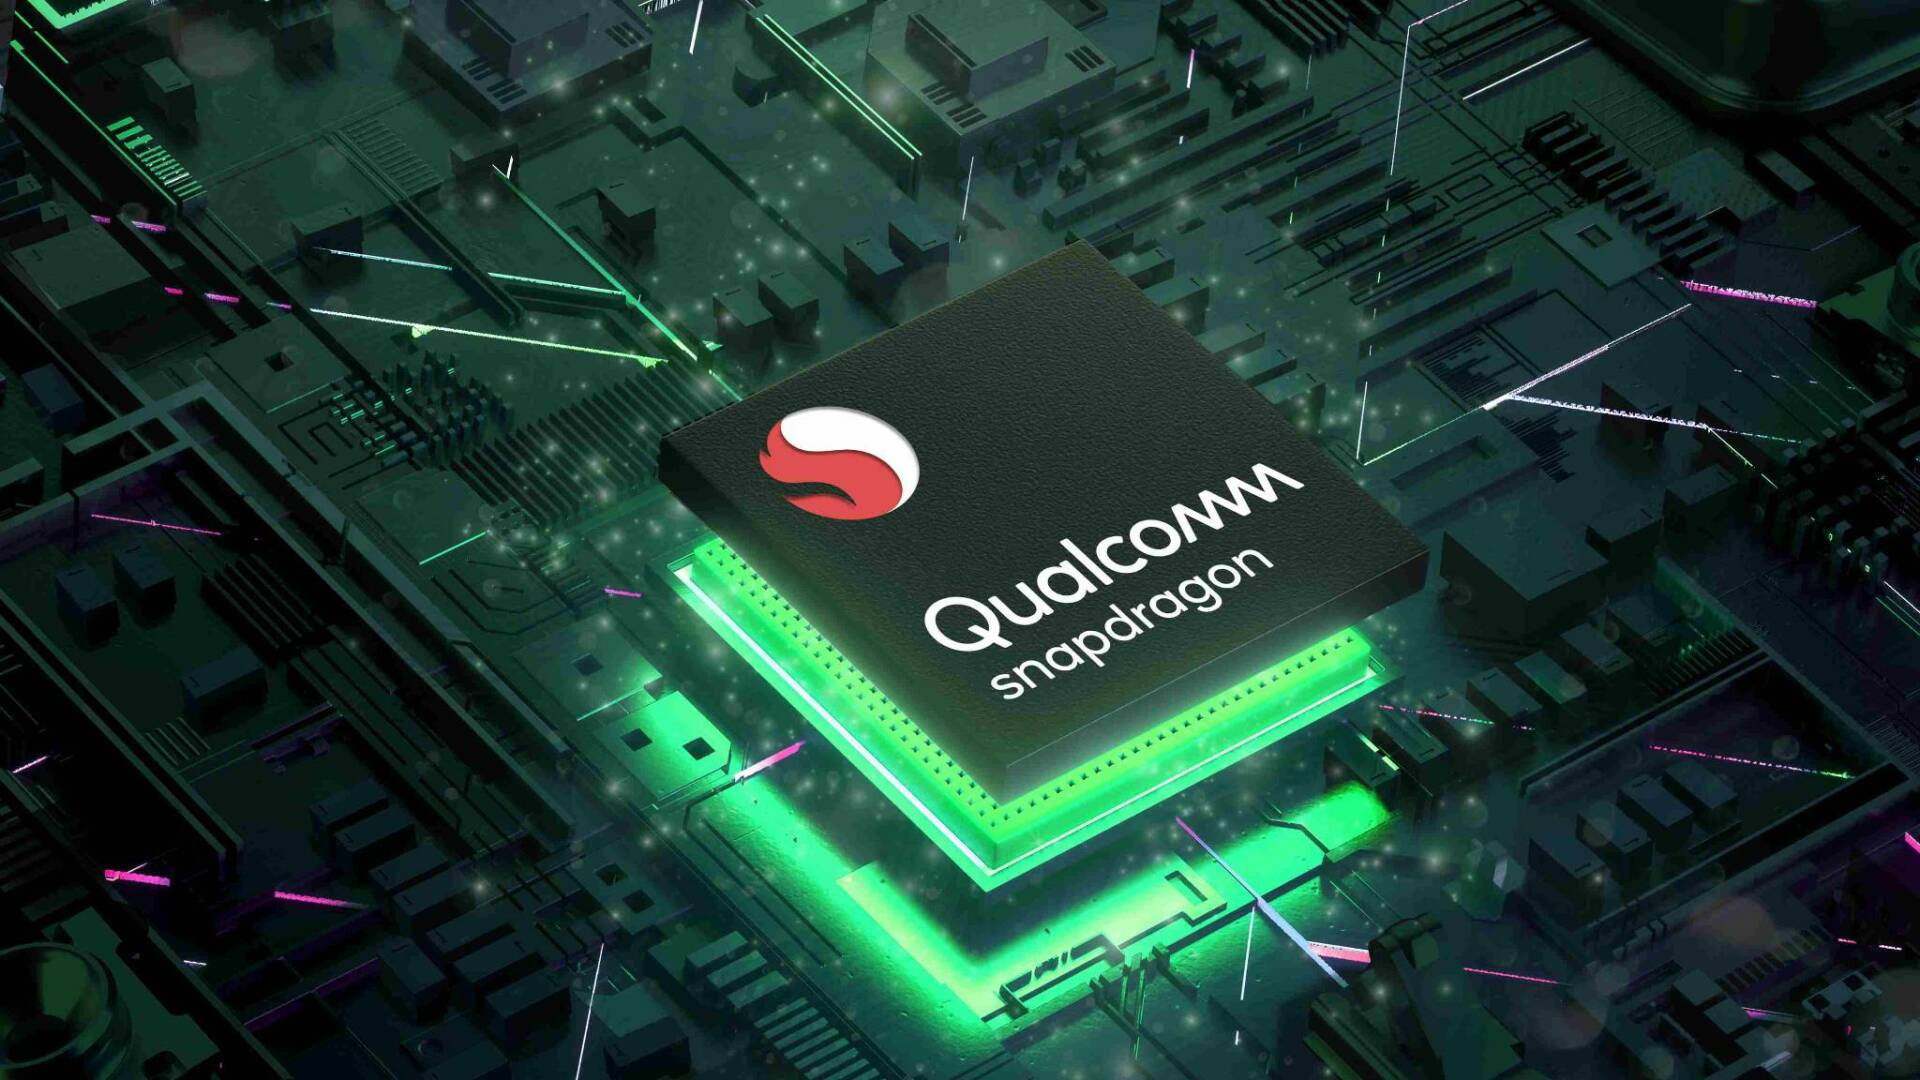 Qualcomm Snapdragon generica